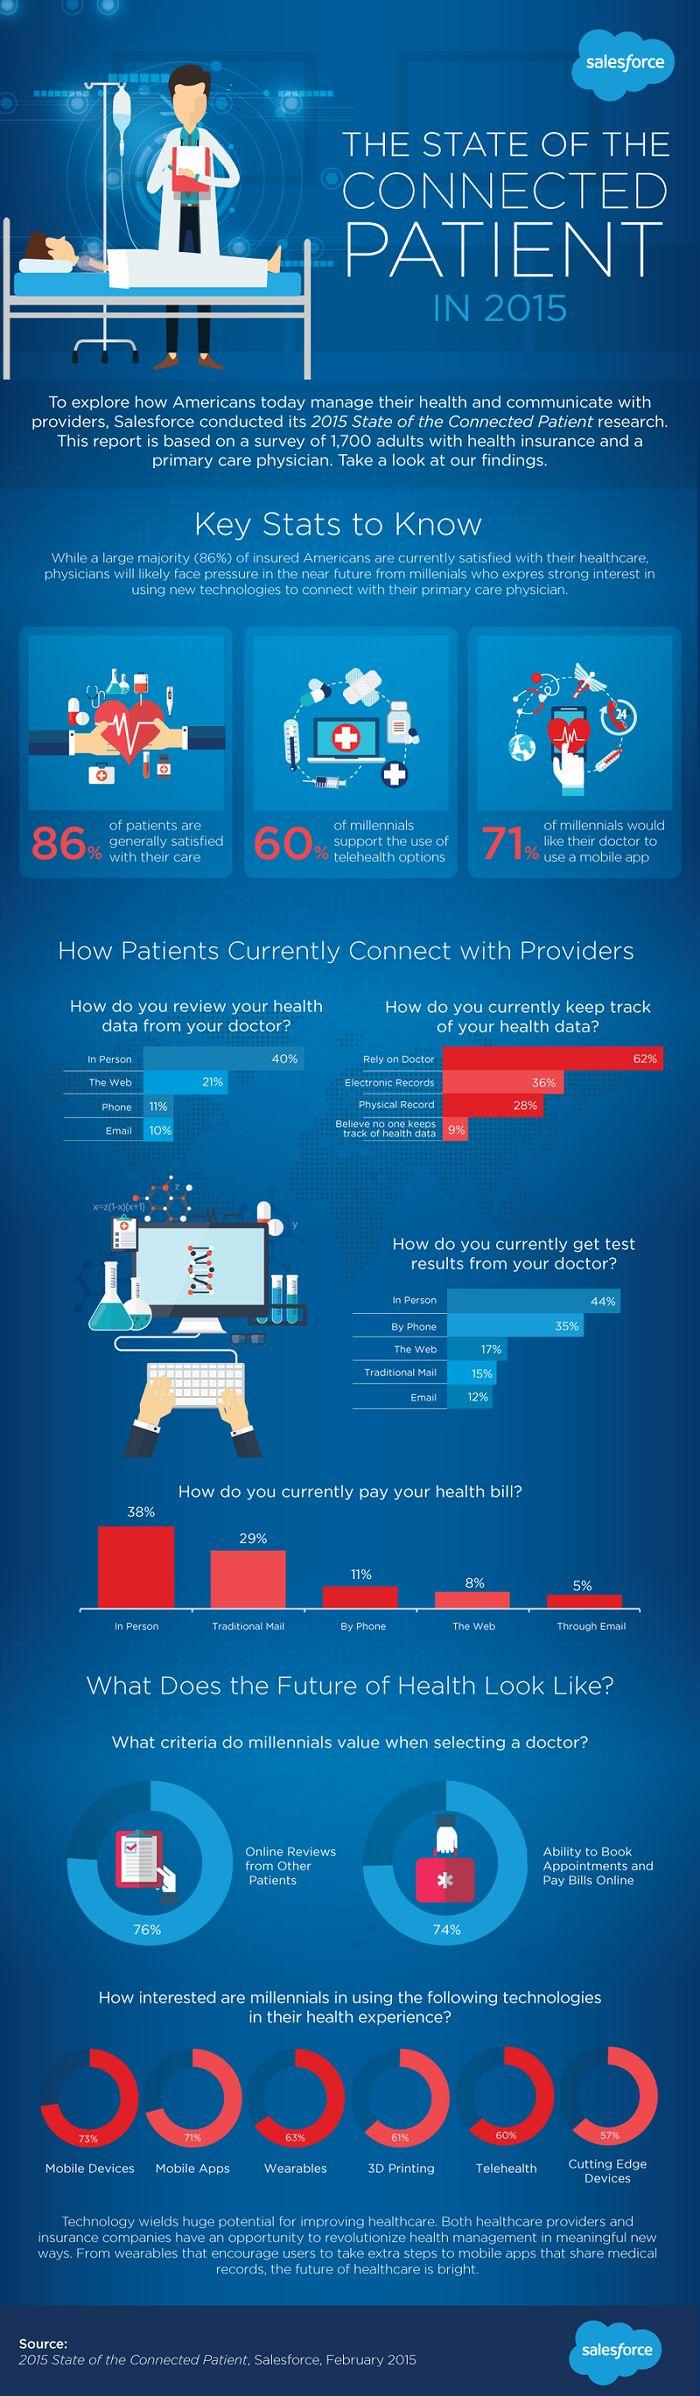 #future #health #patient #infographic